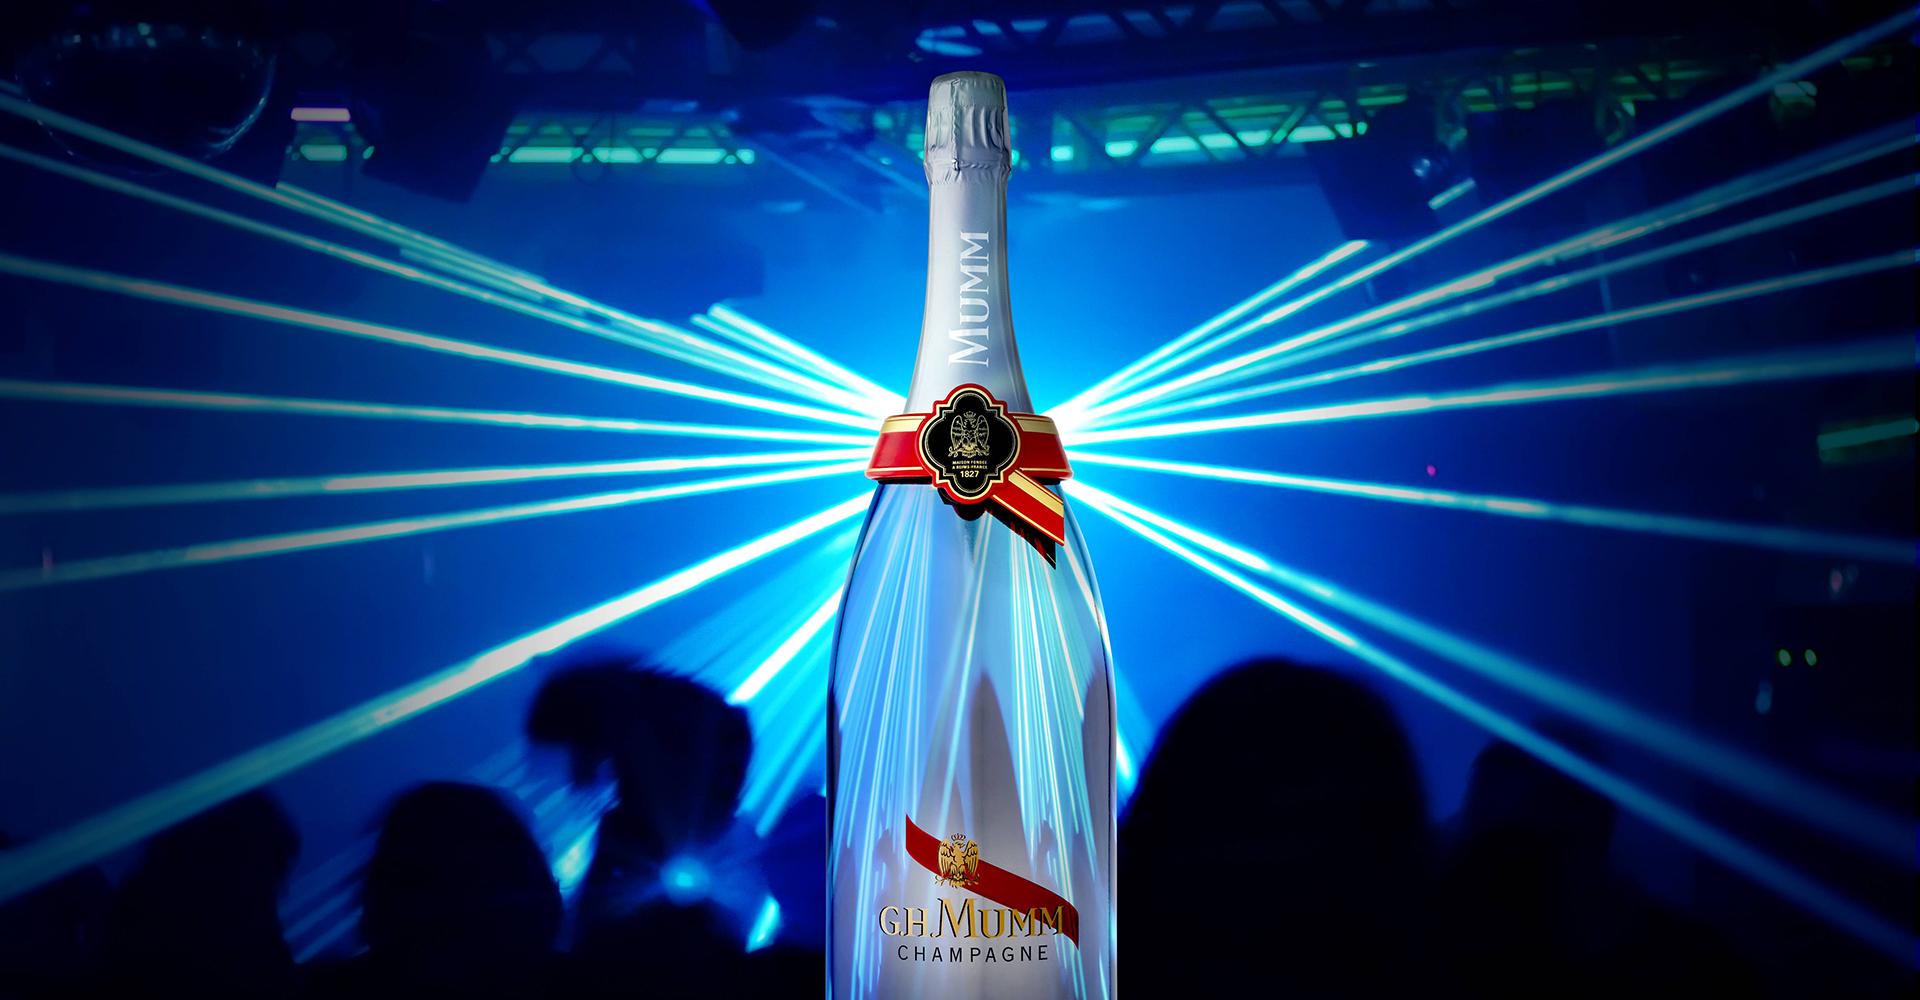 G.H.Mumm - connected bottle - marketing shot - club - laser effect - spotlight on you